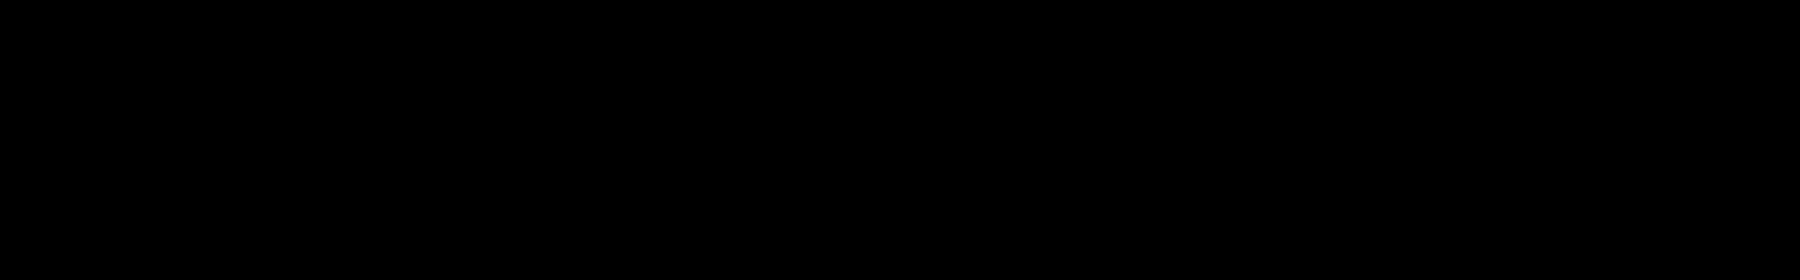 Bulb - Analog Drum Samples audio waveform